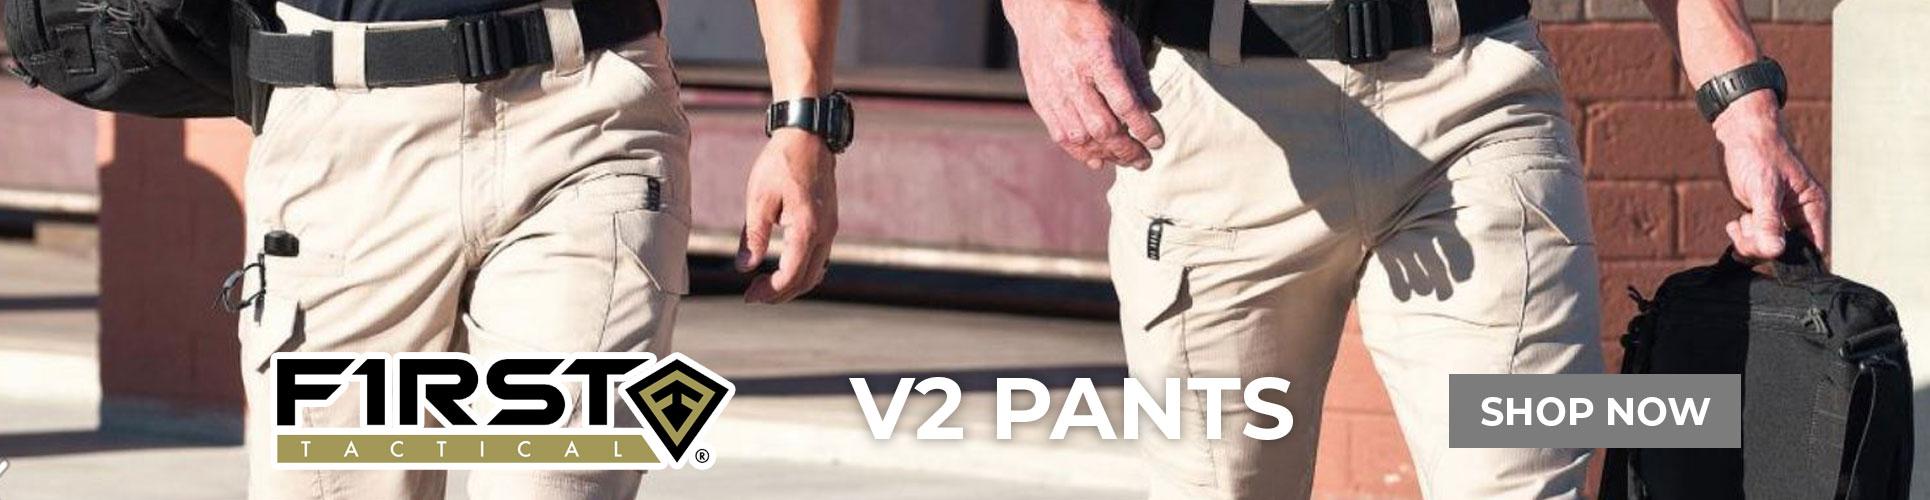 Shop First Tactical V2 Pants